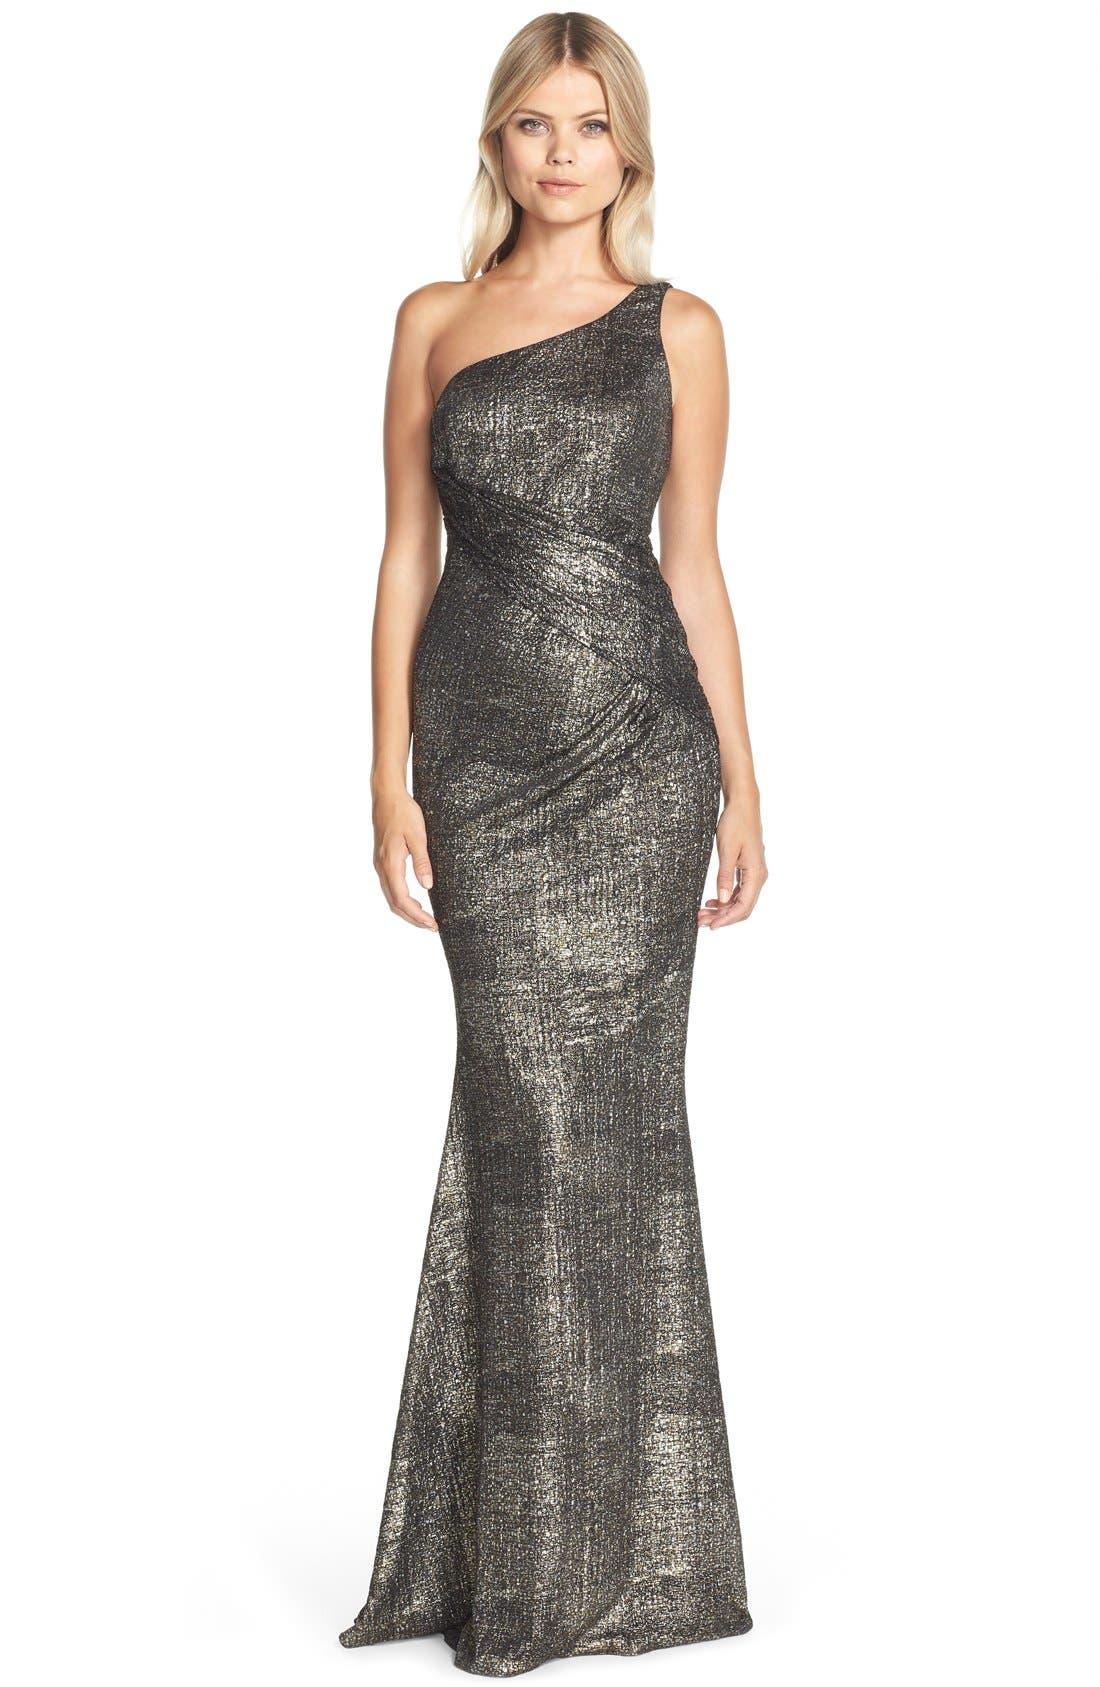 Main Image - Jay Godfrey 'Windermere' Metallic Jersey Mermaid Gown